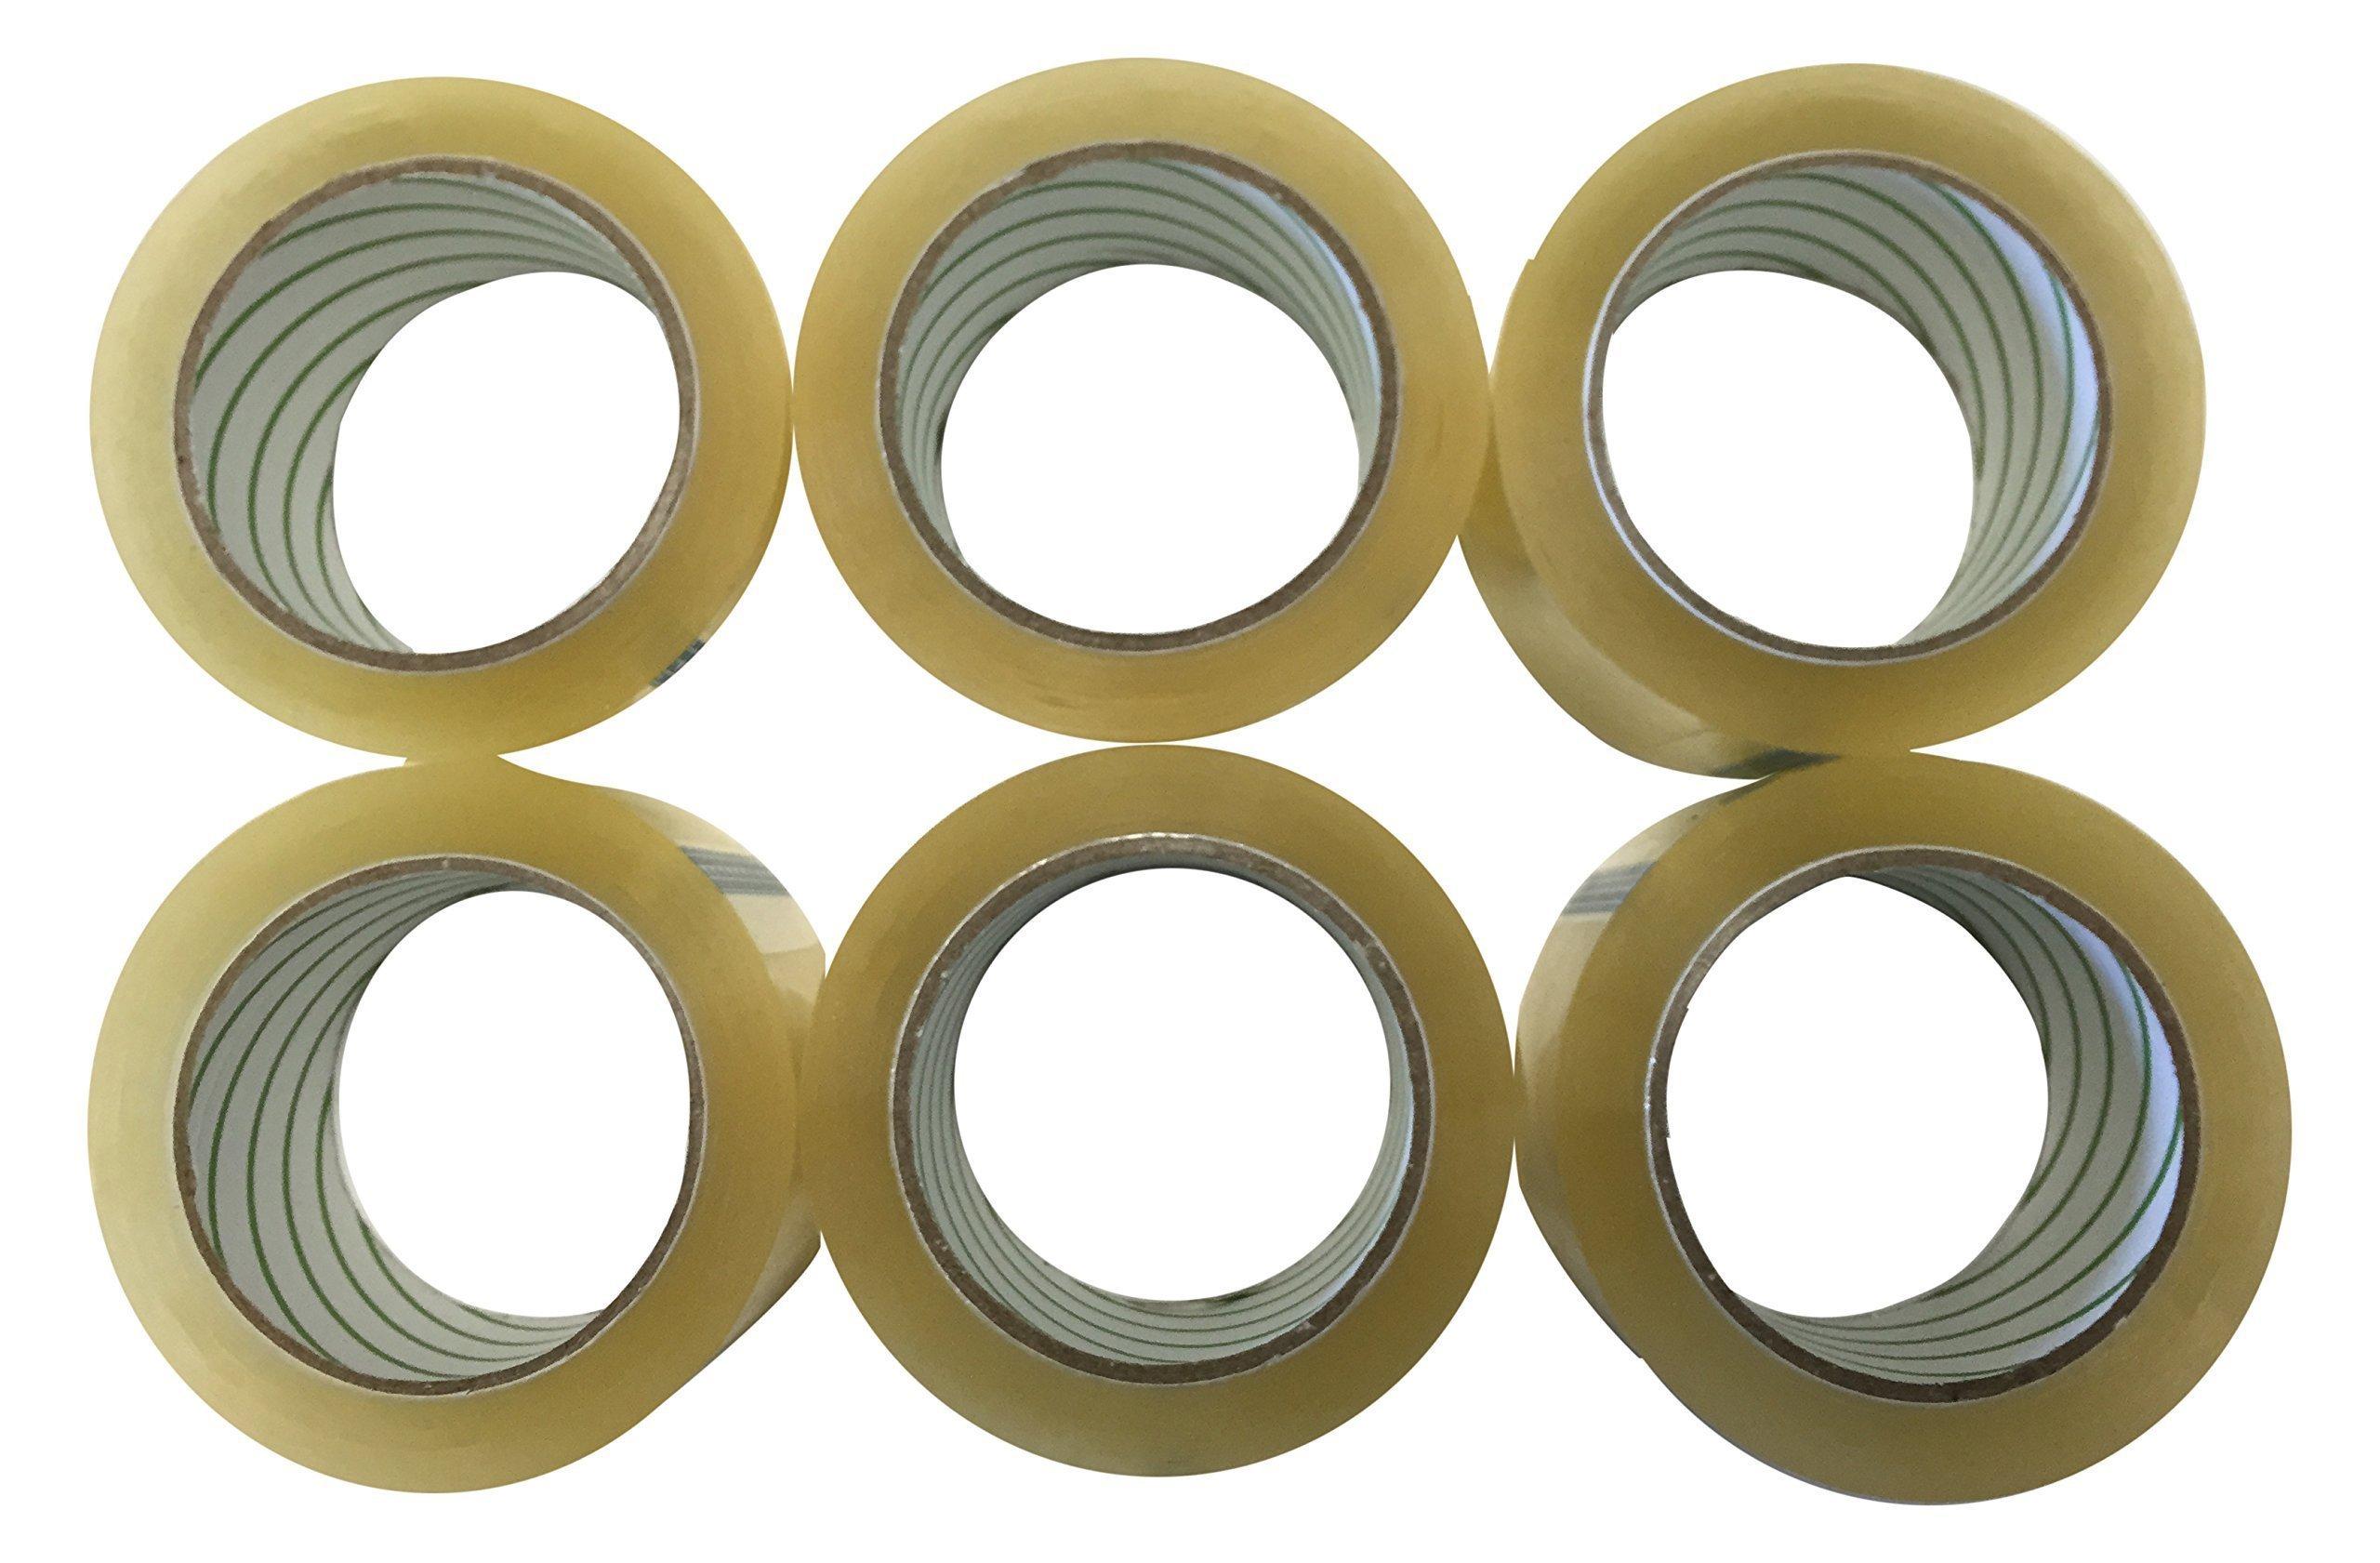 A+ Grade Clear Carton Sealing Tape, 6 Rolls, 110 yd, 2.0 Mile(330')